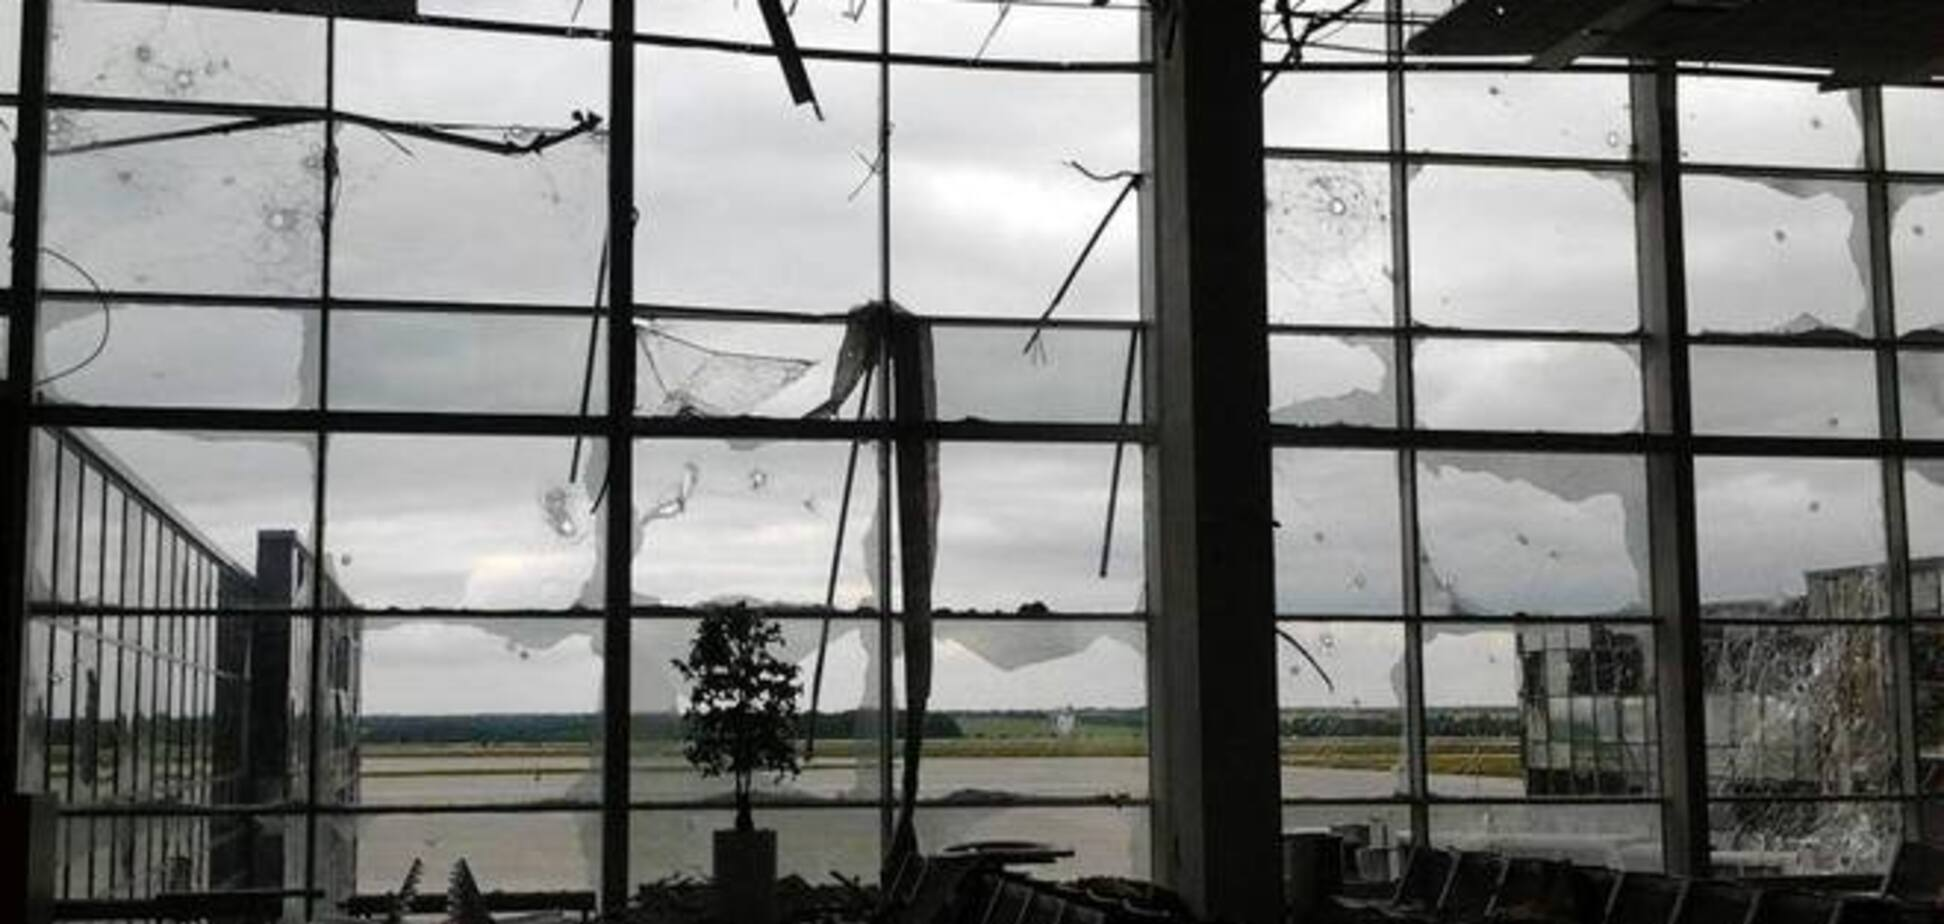 Террористы атакуют донецкий аэропорт минами с 32 кг тротила